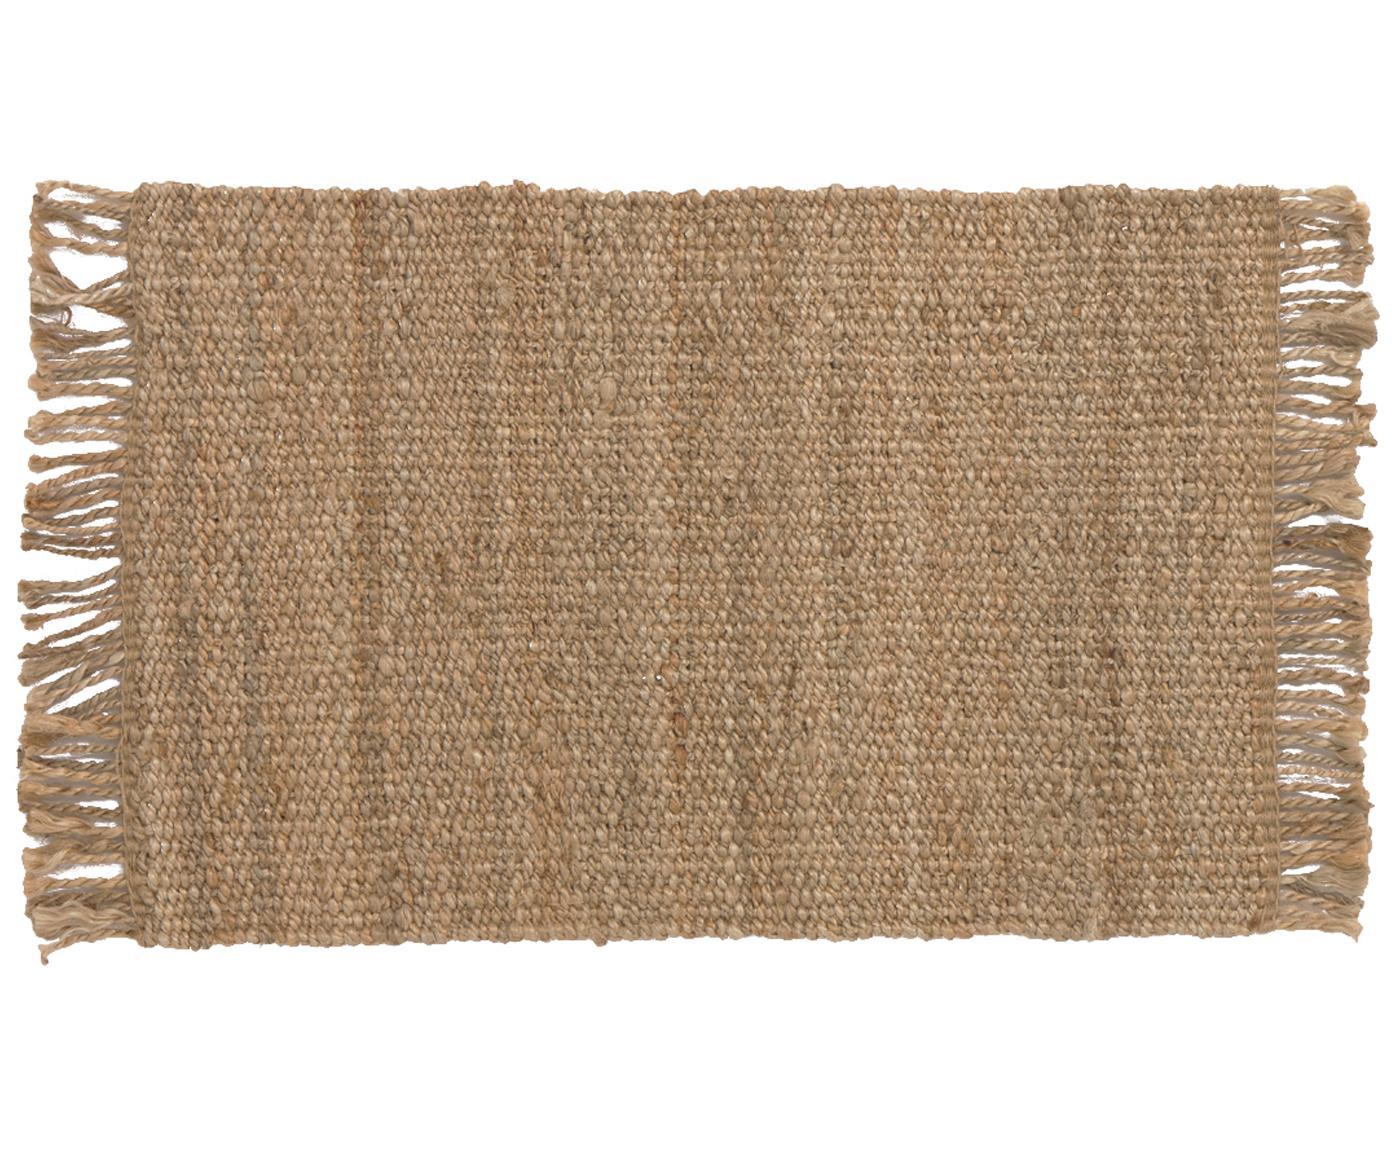 Alfombra artesanal de yute con flecos Cadiz, Yute, Yute, An 60 x L 90 cm (Tamaño XXS)